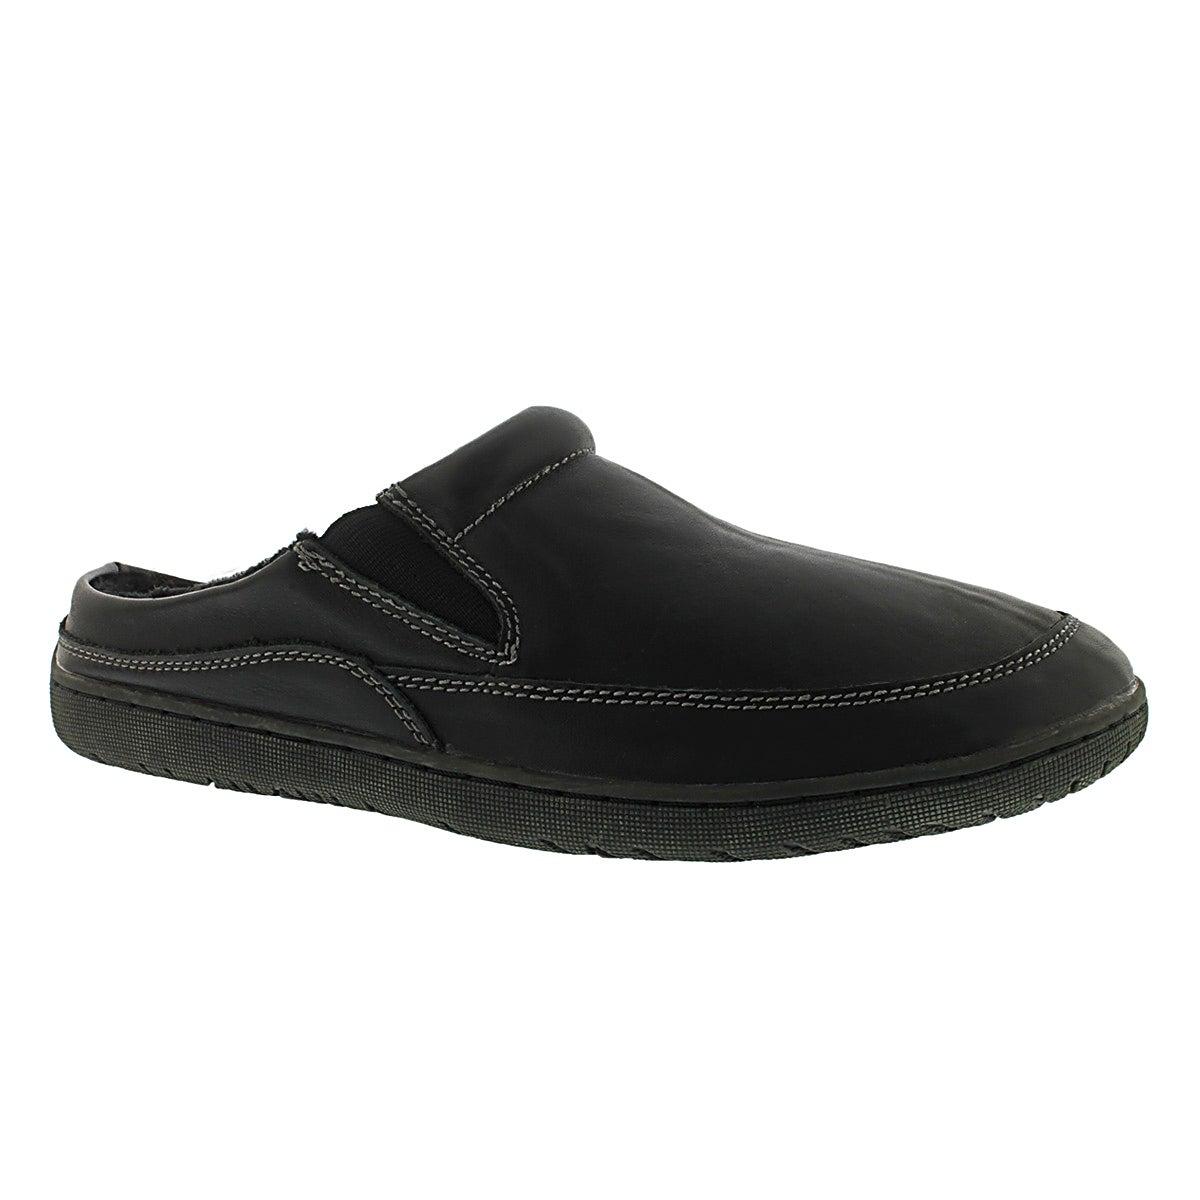 Mns Parkdale black open back slipper